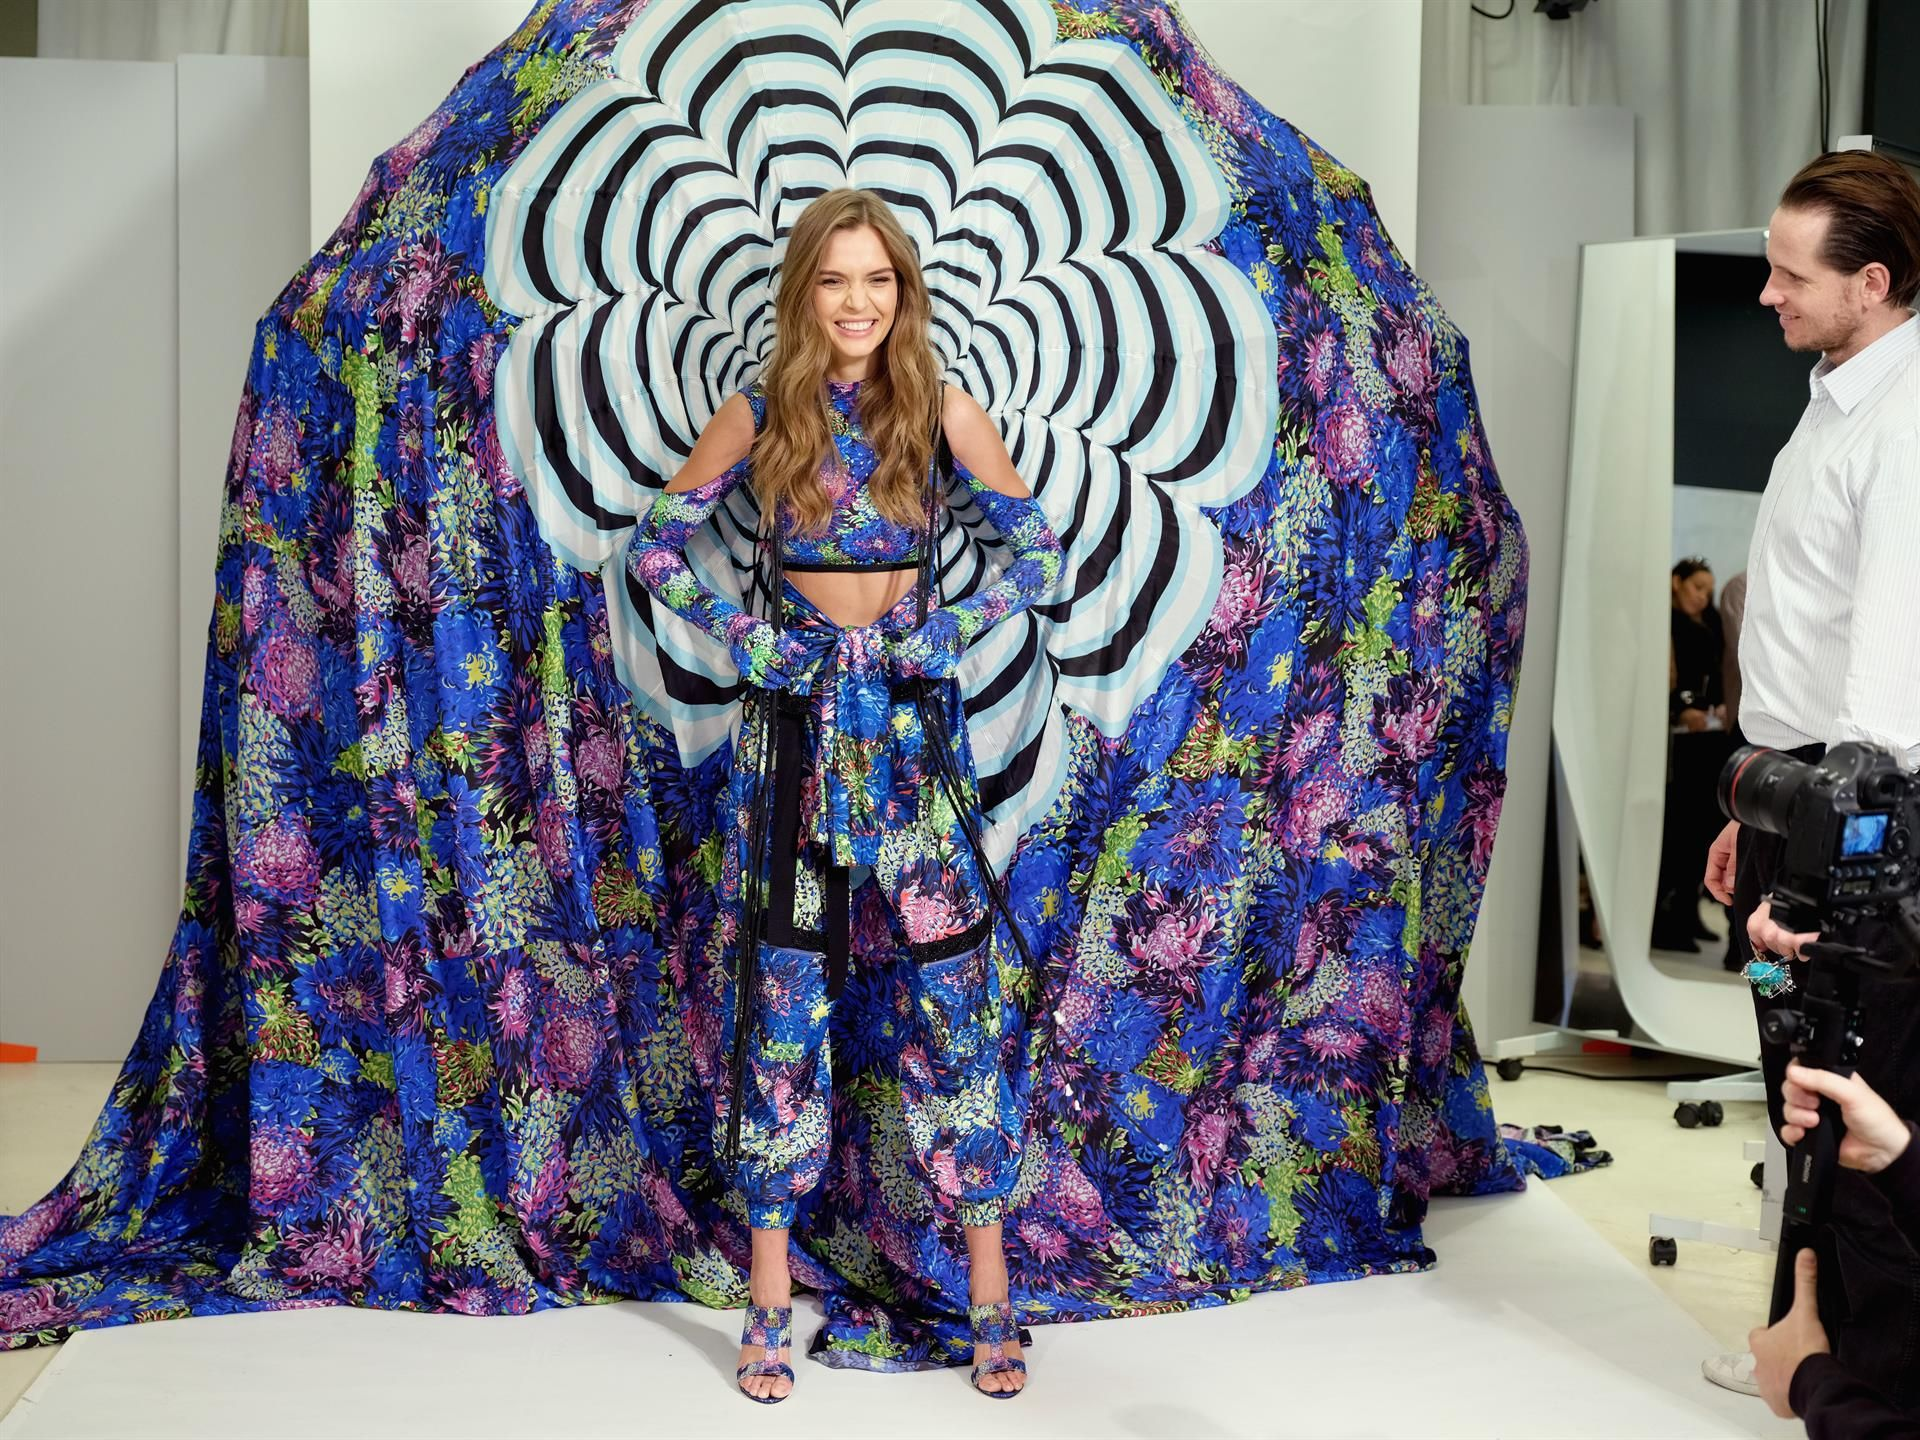 61fc39540f78f Victoria's Secret Fashion Show 2018 Date, NYC Venue, Models, and More